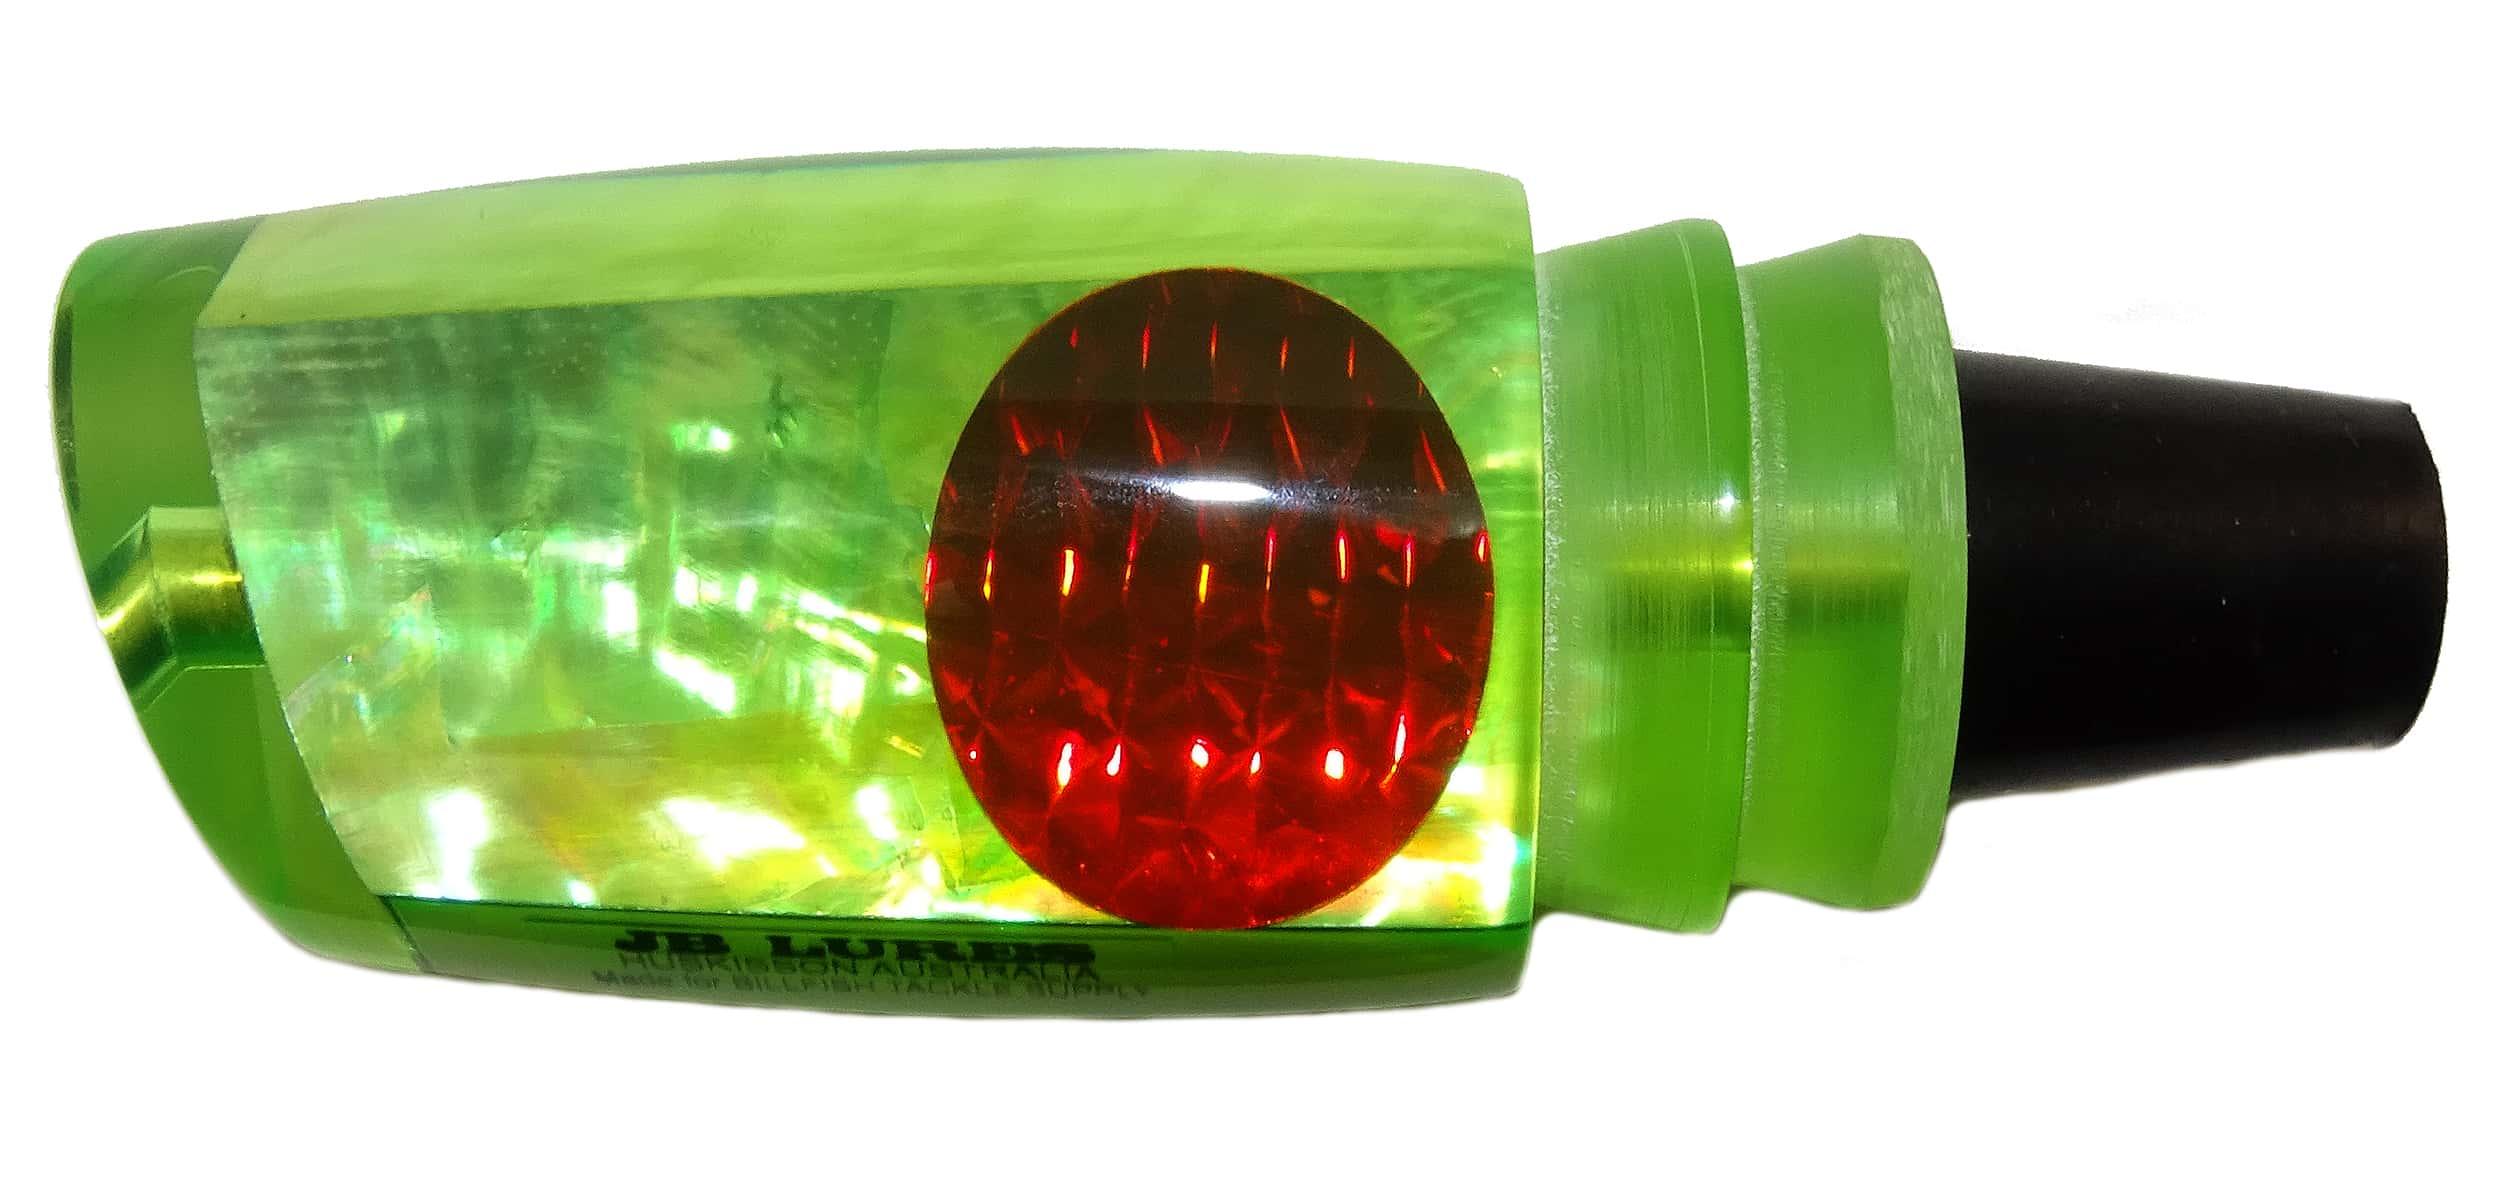 JB Lures - Ripper Series - Head - Fluoro Green with Raw Agoya Shell